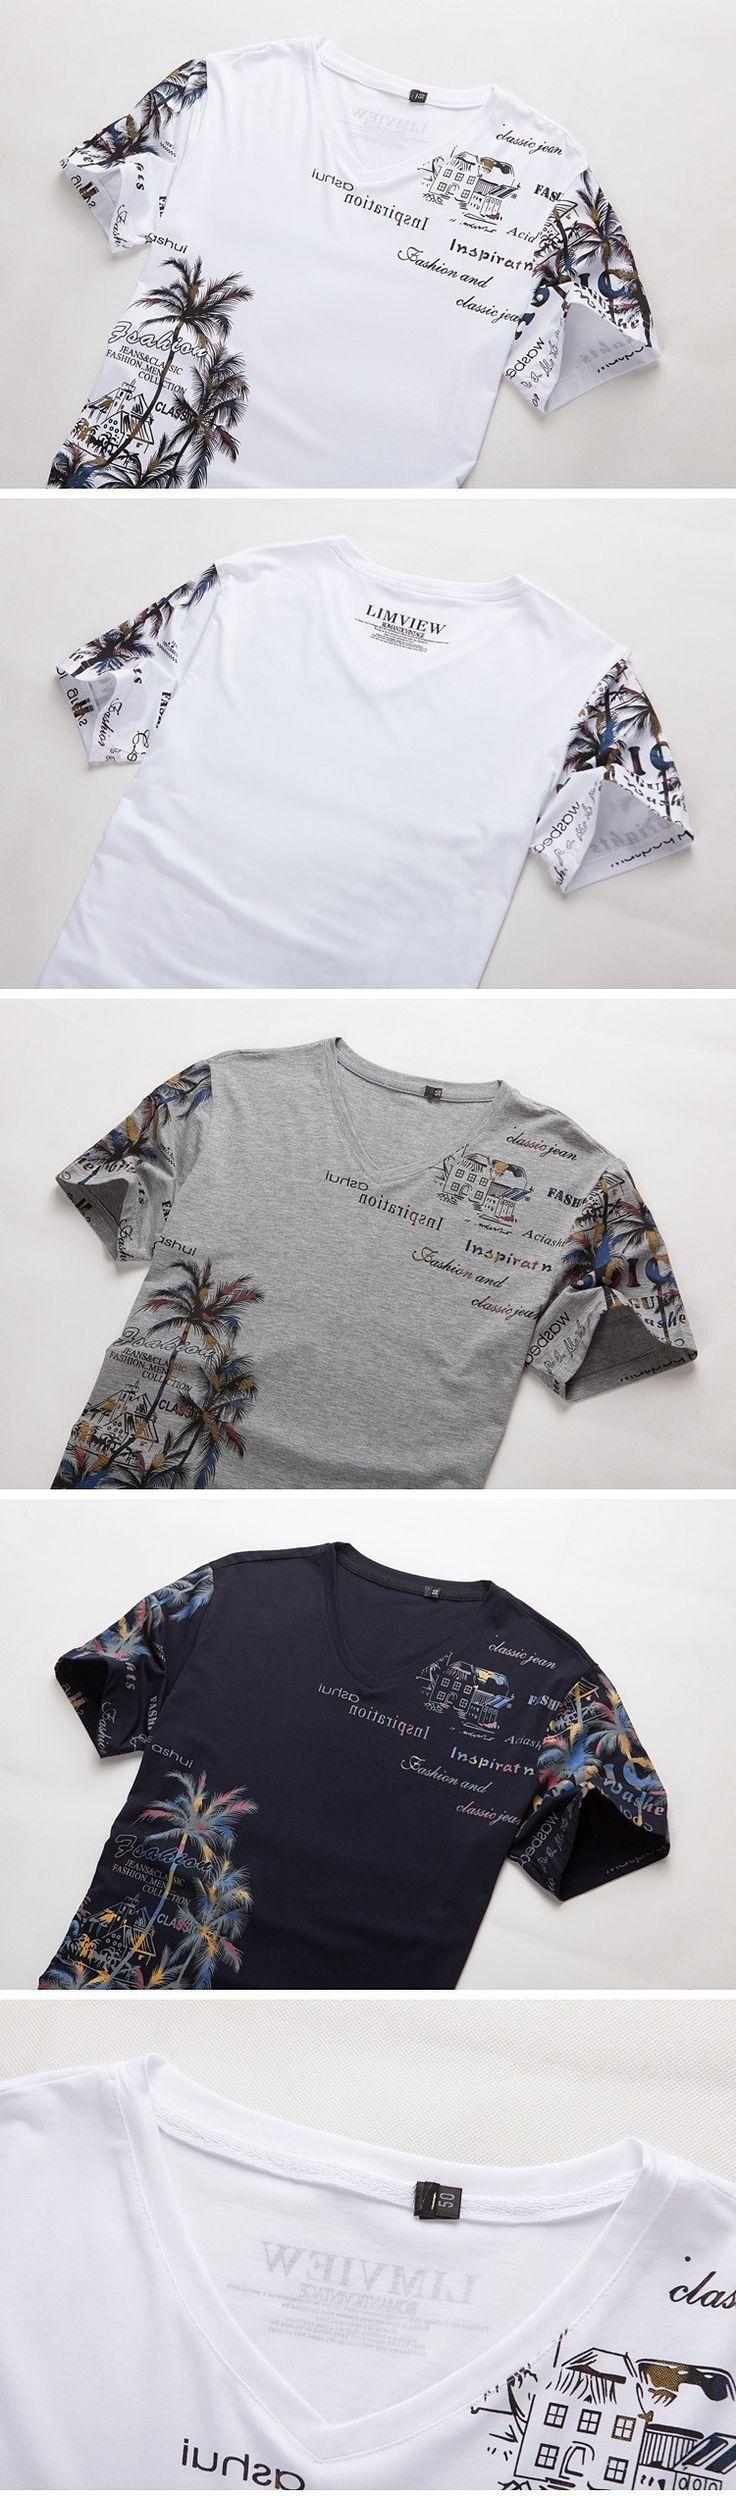 Now available at DIGDU: Cotton Men's T-sh... Check it out here! http://www.digdu.com/products/cotton-mens-t-shirt-v-neck-fashion-slim-short-sleeve-t-shirt-casual-men-holiday-beach-style-summer-print-t-shirt-top-4xl-5xl?utm_campaign=social_autopilot&utm_source=pin&utm_medium=pin